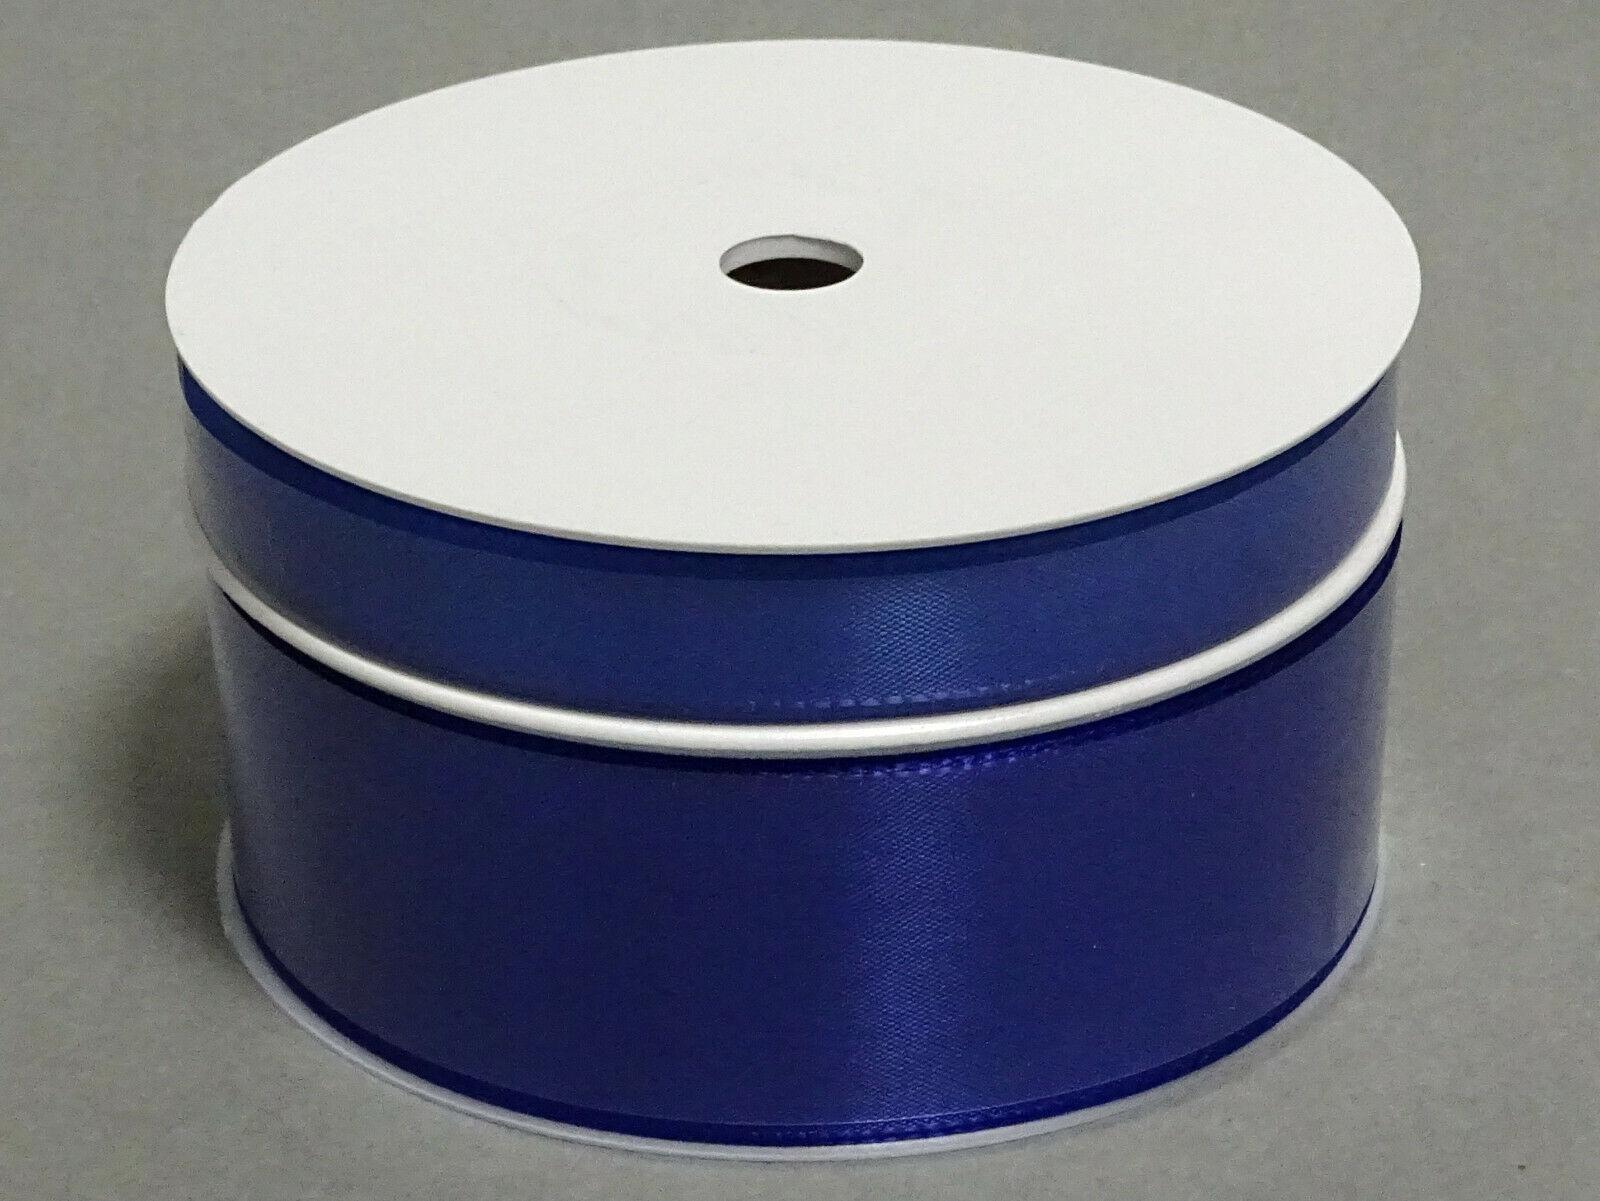 Seidenband Schleifenband 50 m x 15 / 25 / 40mm Dekoband ab 0,08€/m Geschenkband  - Königsblau 120, 15 mm x 50 m